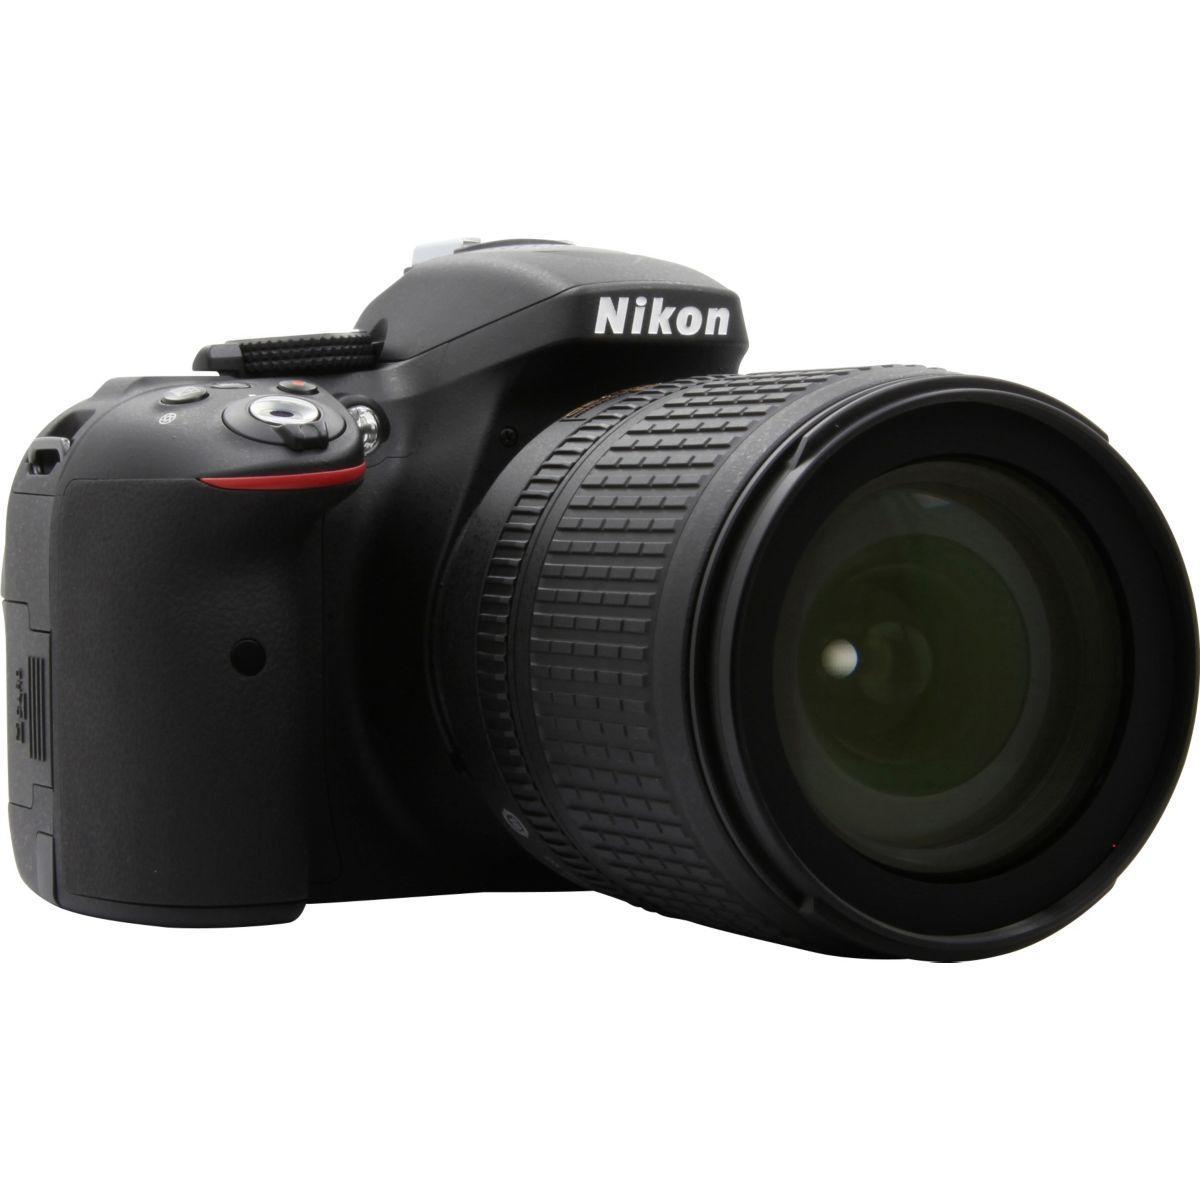 Appareil photo reflex nikon d5300 + af-s 18-105vr